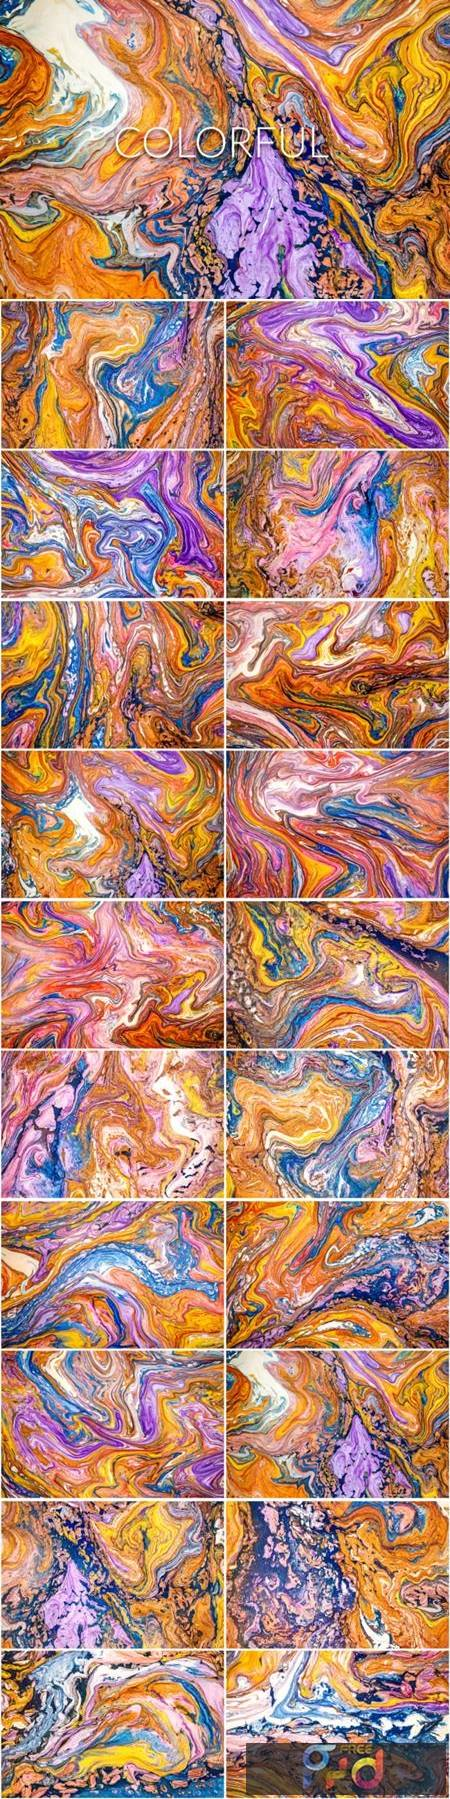 Handmade Liquid Paint - Colorful 4063495 1